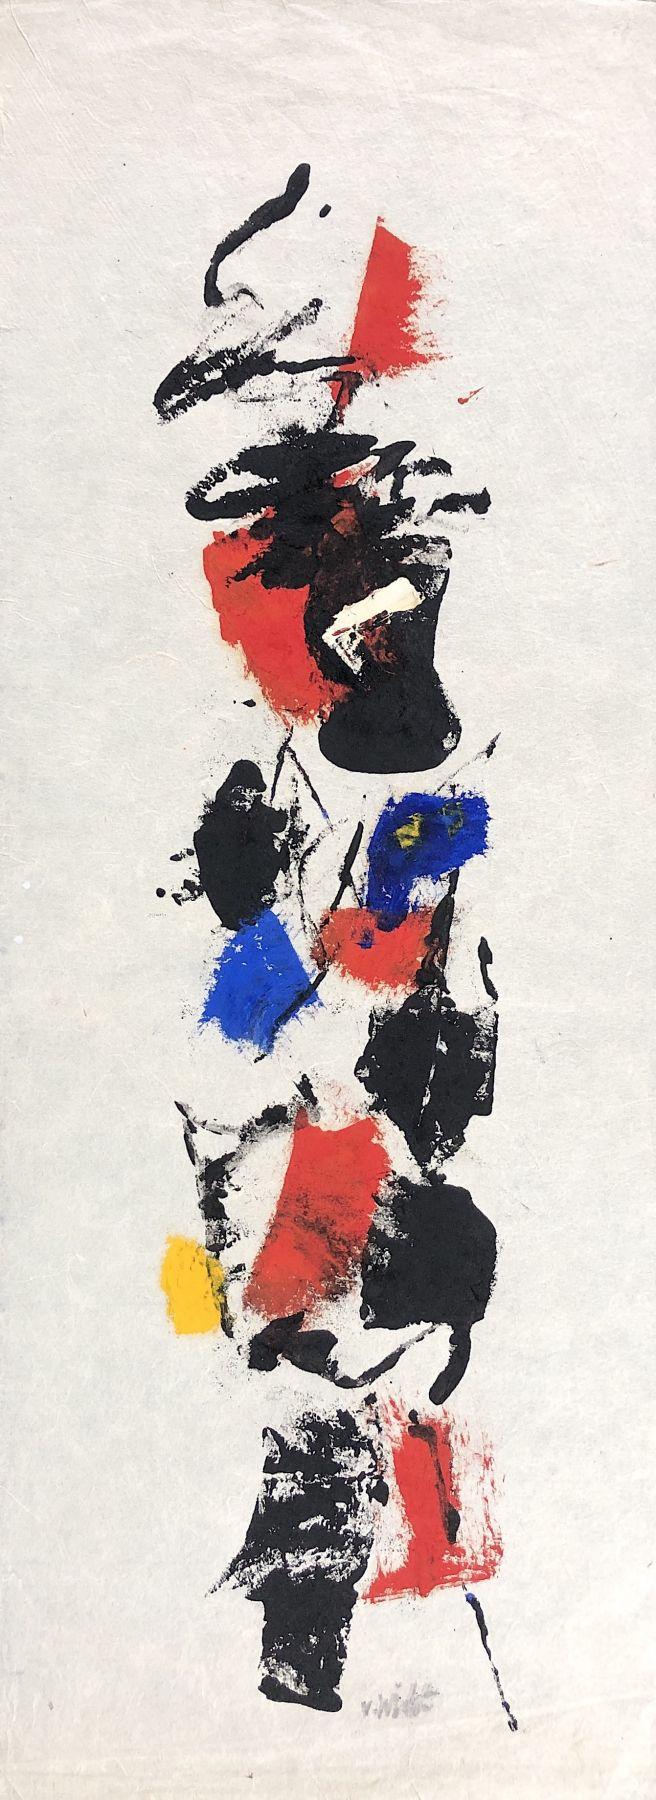 Sold untitled abstraction by John Von Wicht.